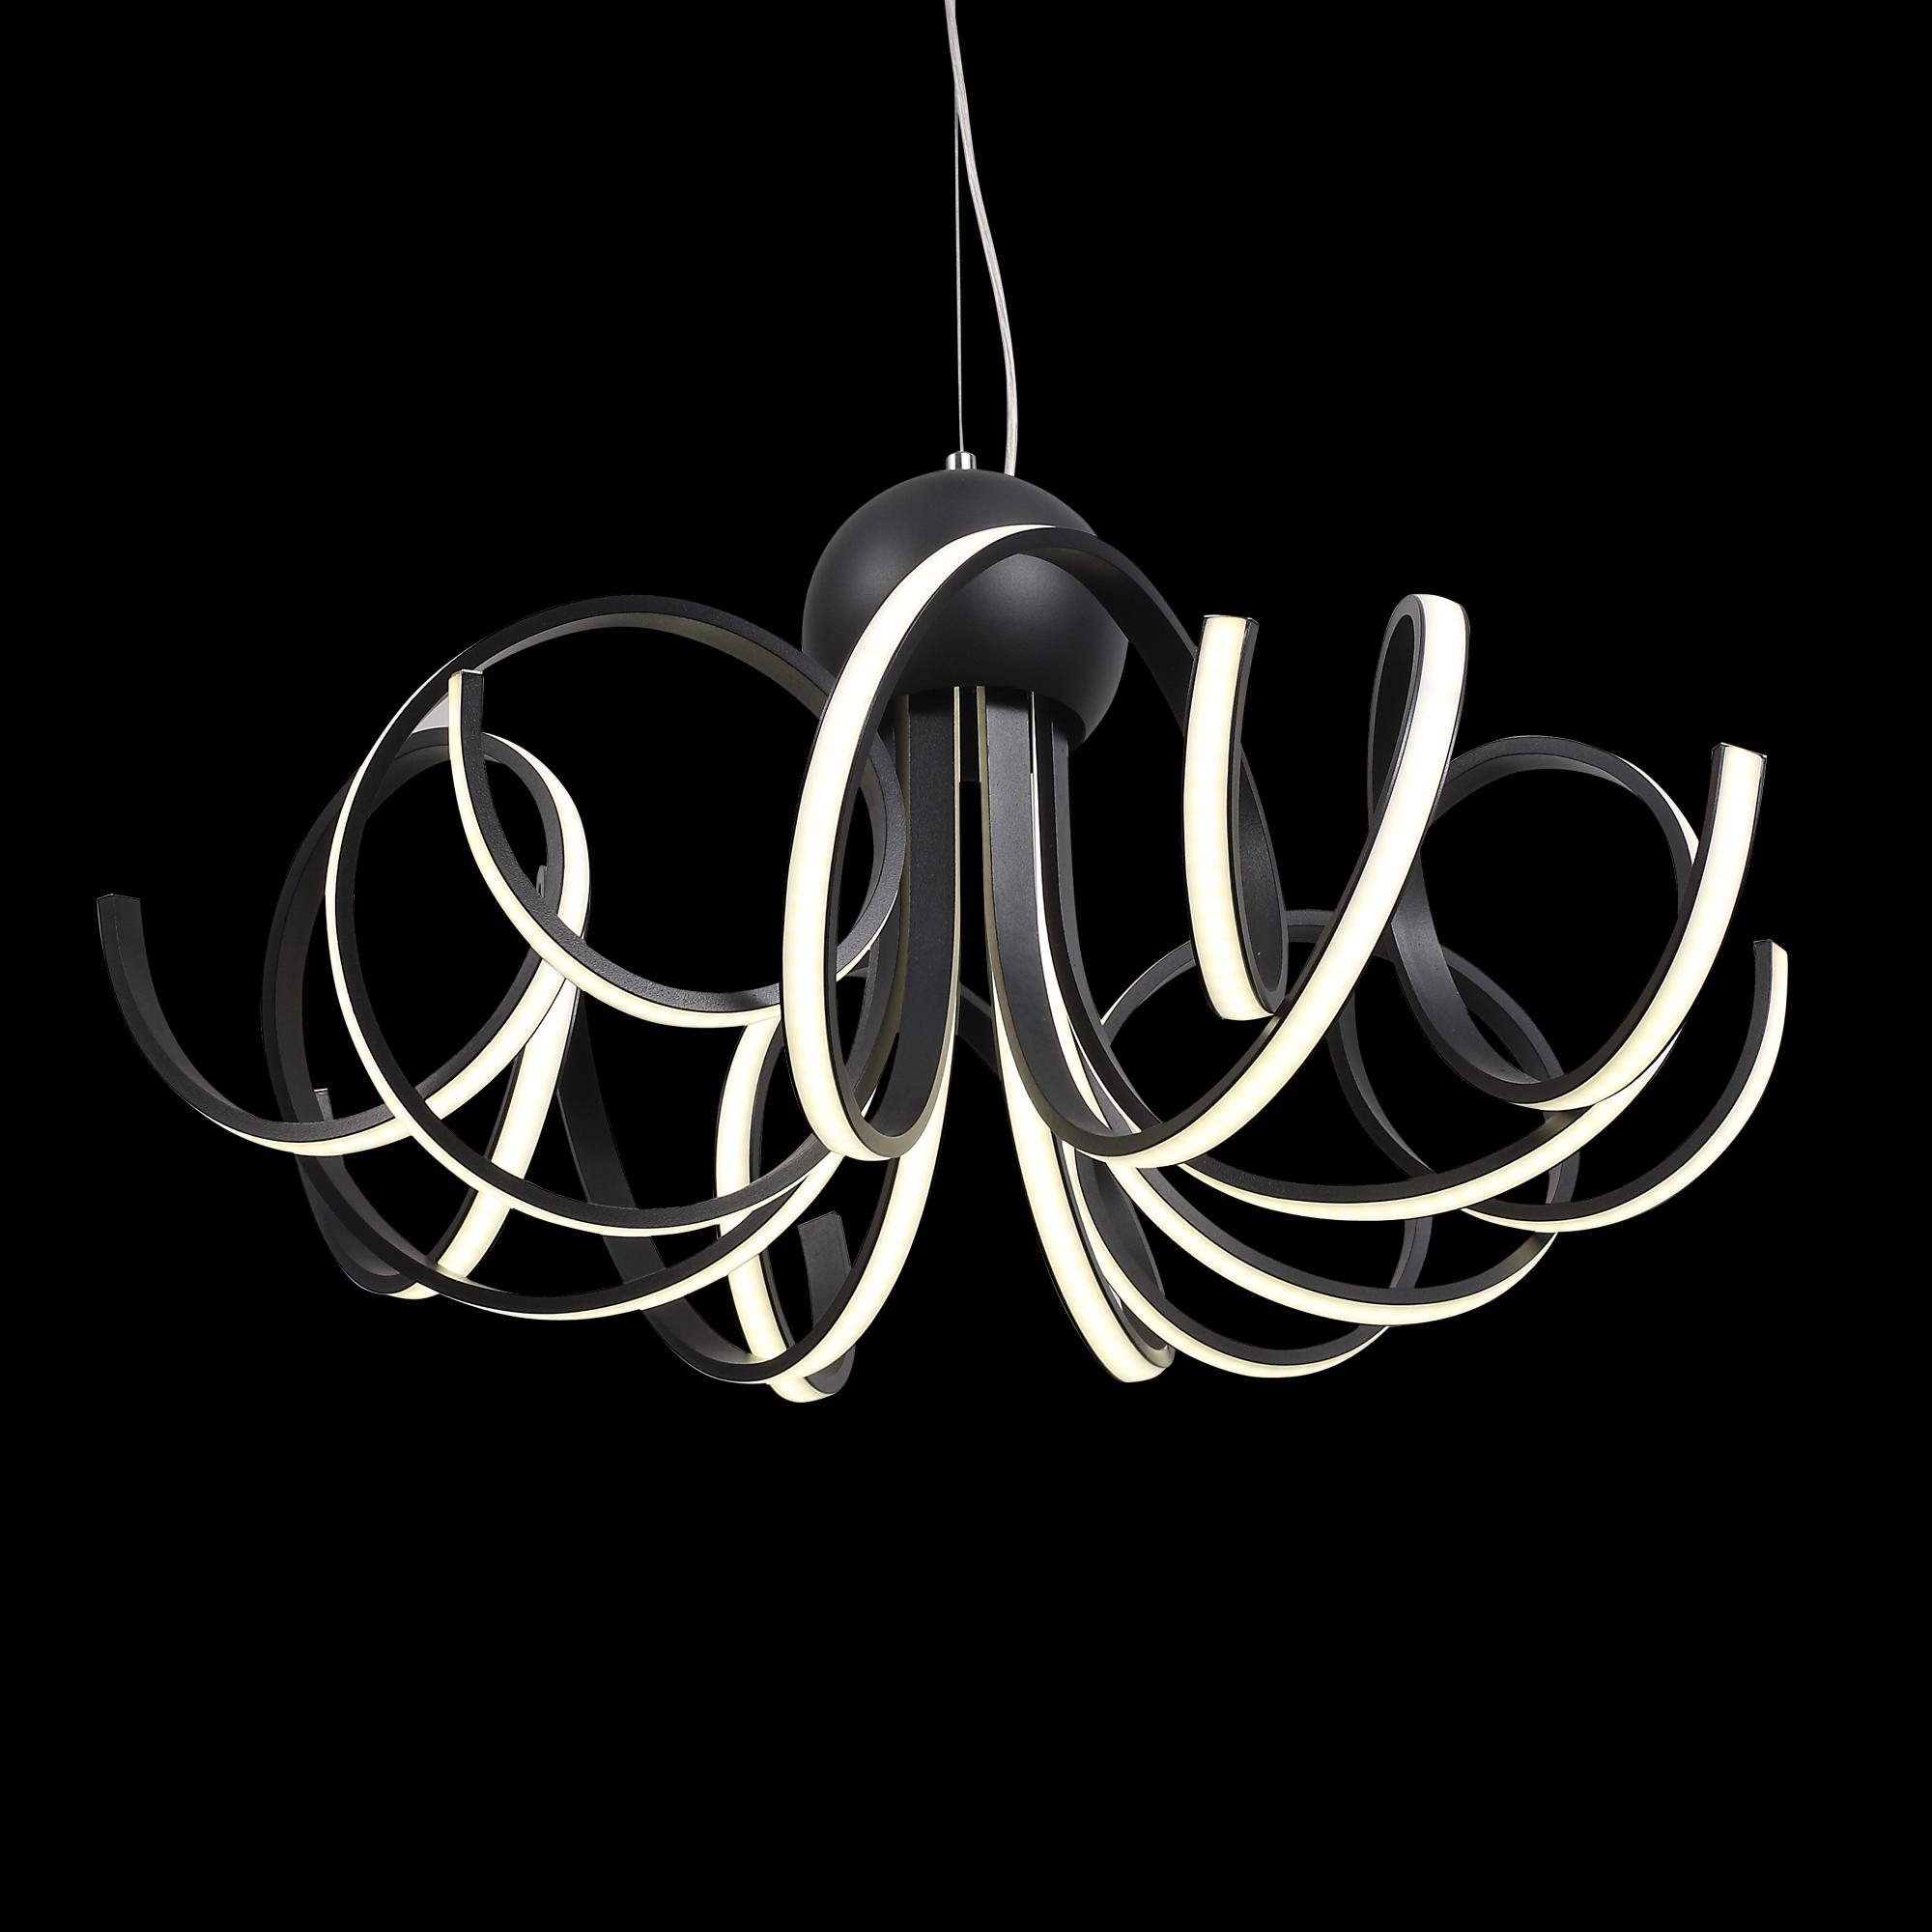 Подвесная светодиодная люстра ST Luce Fondere SL906.403.08, LED 120W 4000K (дневной) - фото 4